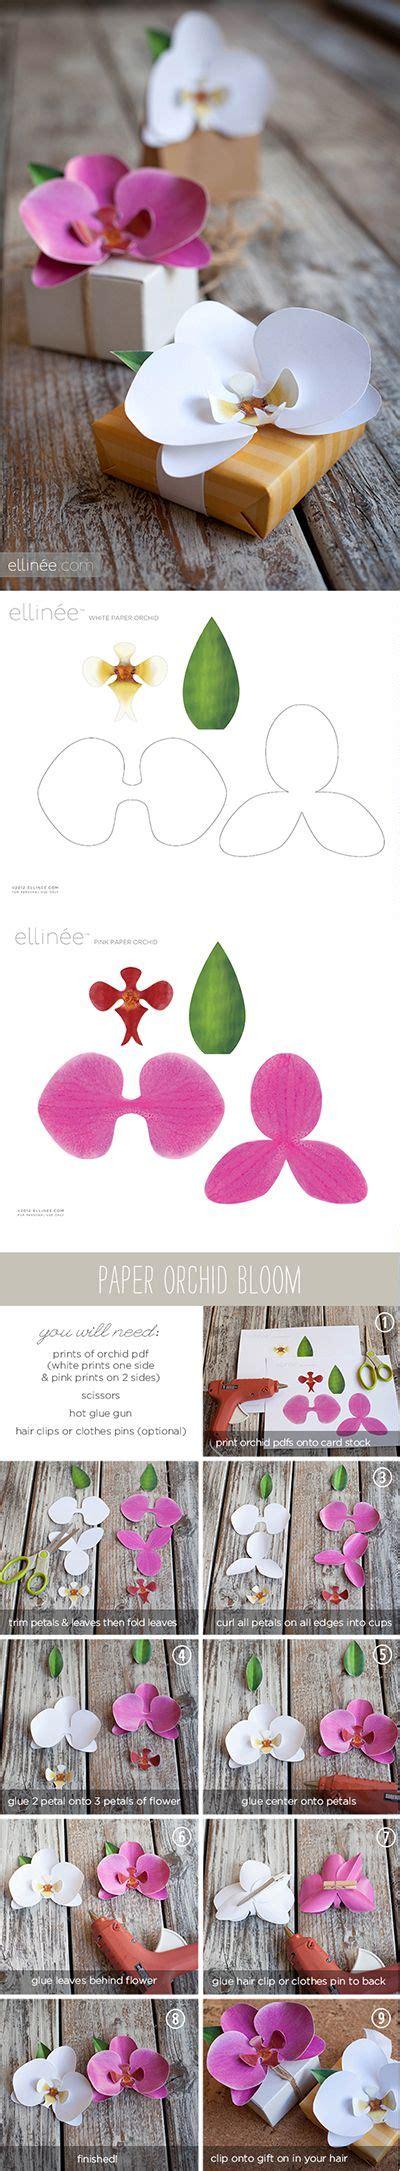 printable paper orchid oscar de la renta s decor line make paper the white and